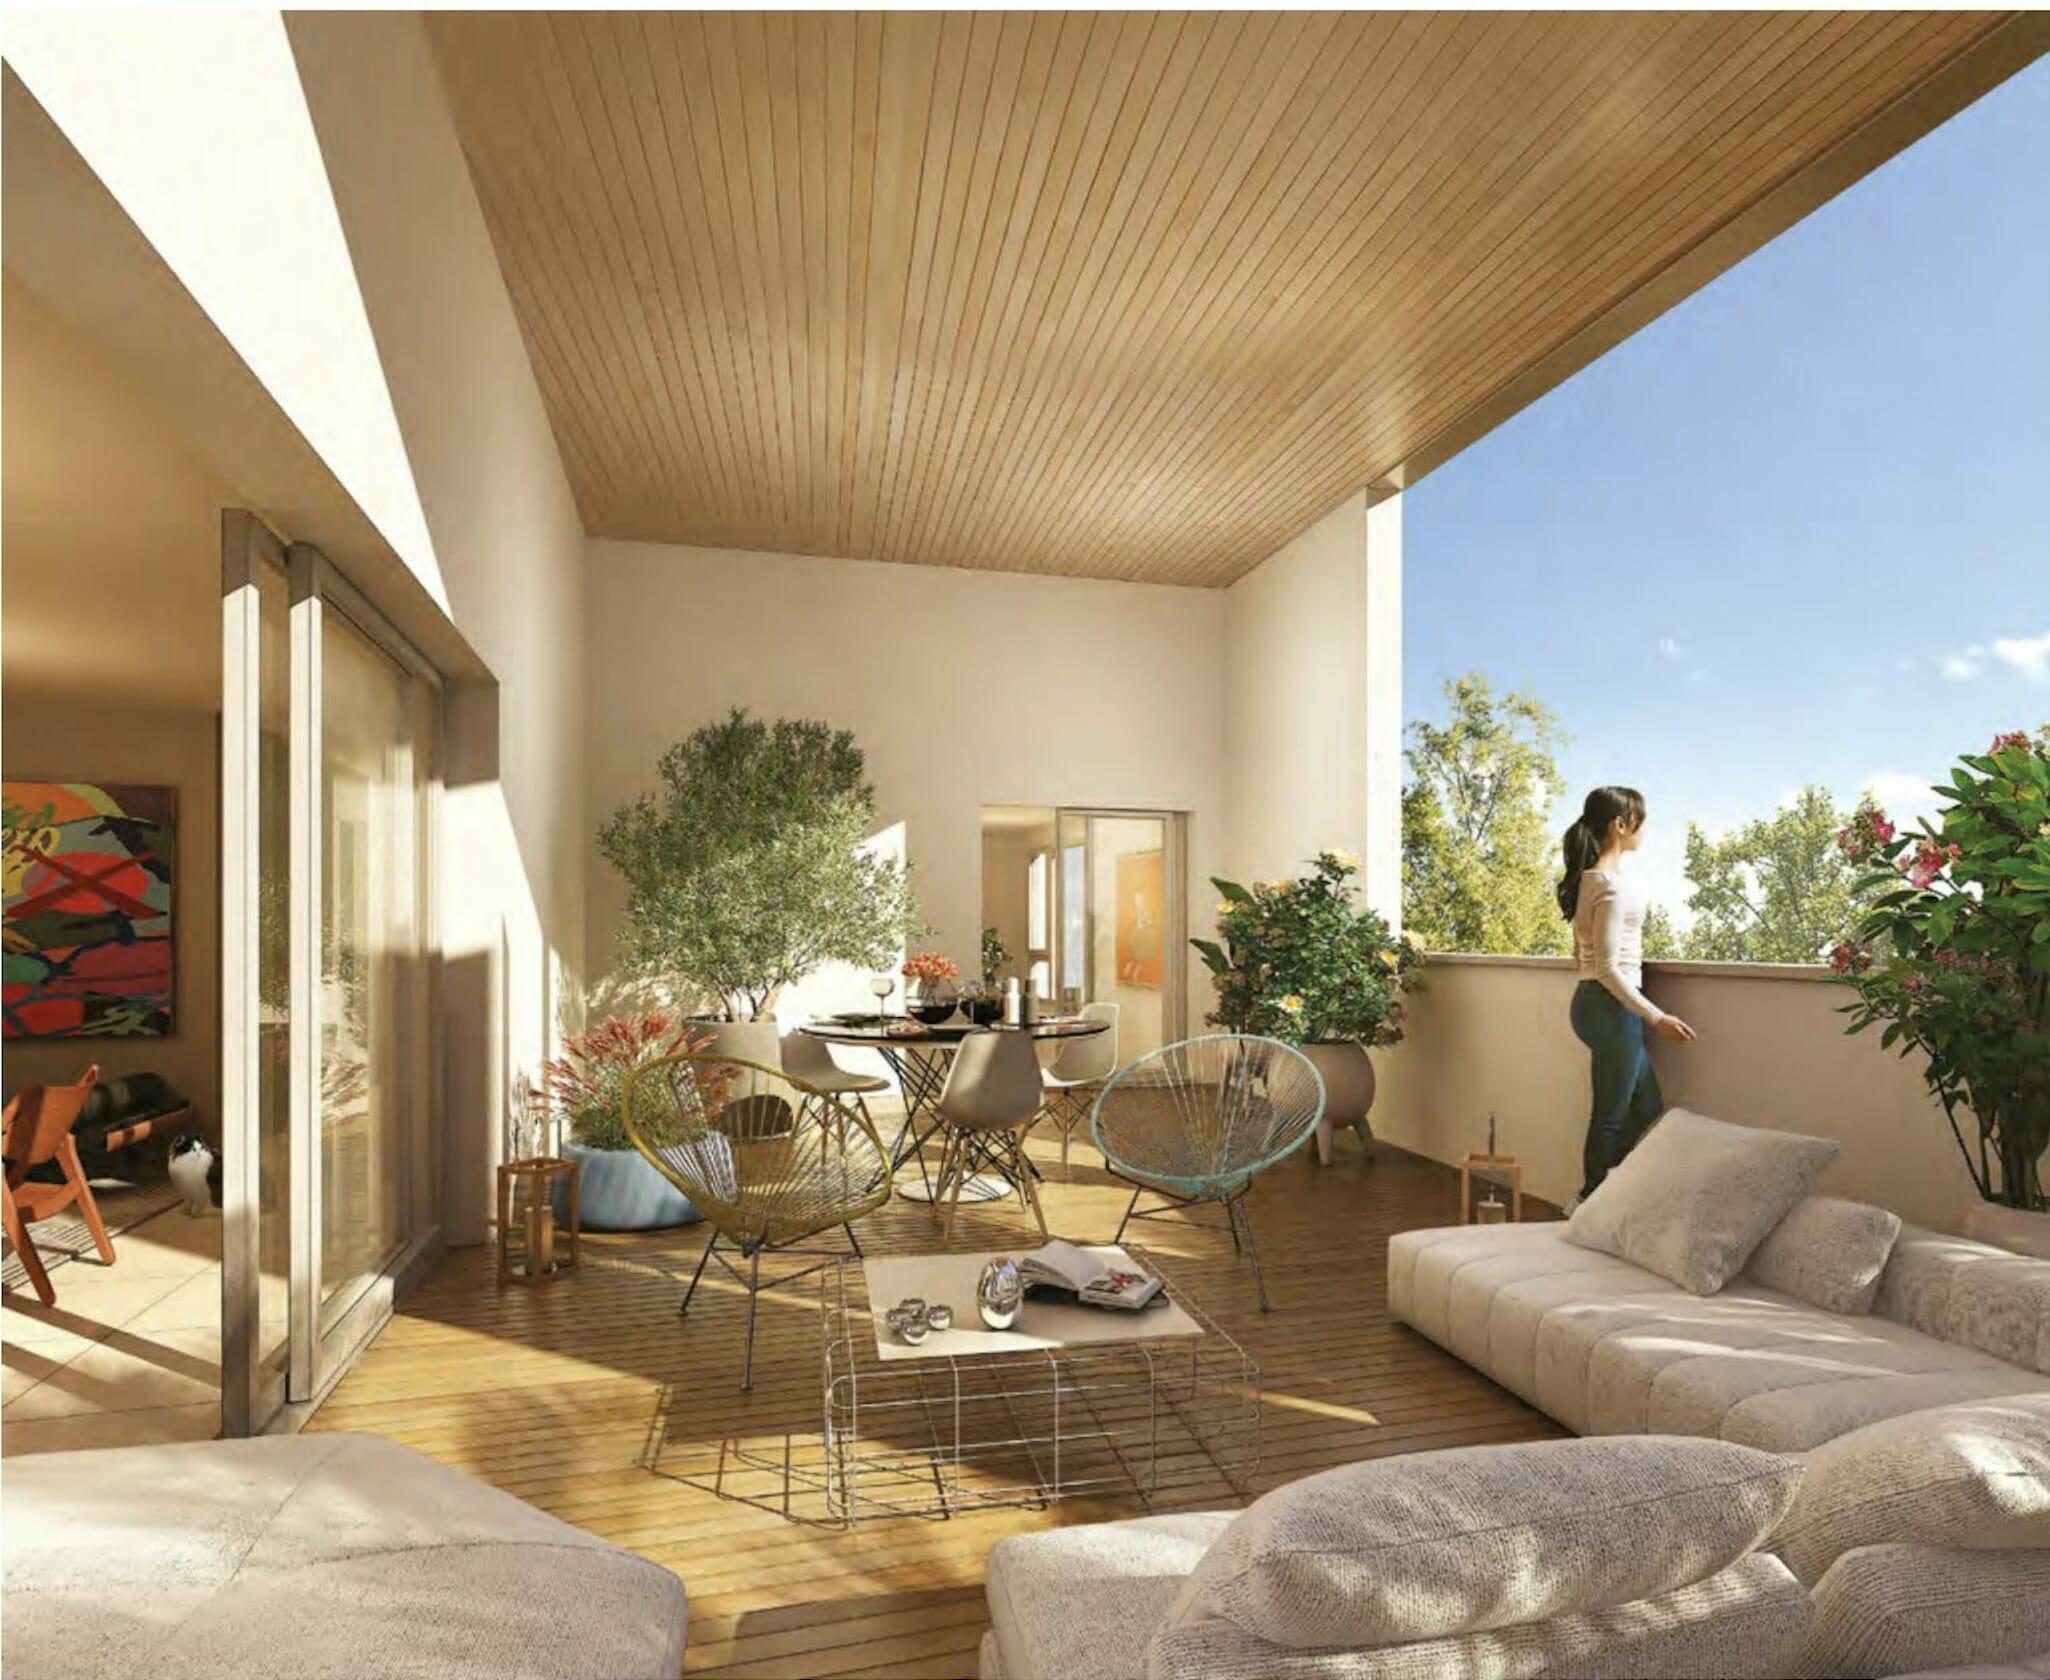 Rive-du-Parc-Altarea-Cogedim-Urbanhouse360